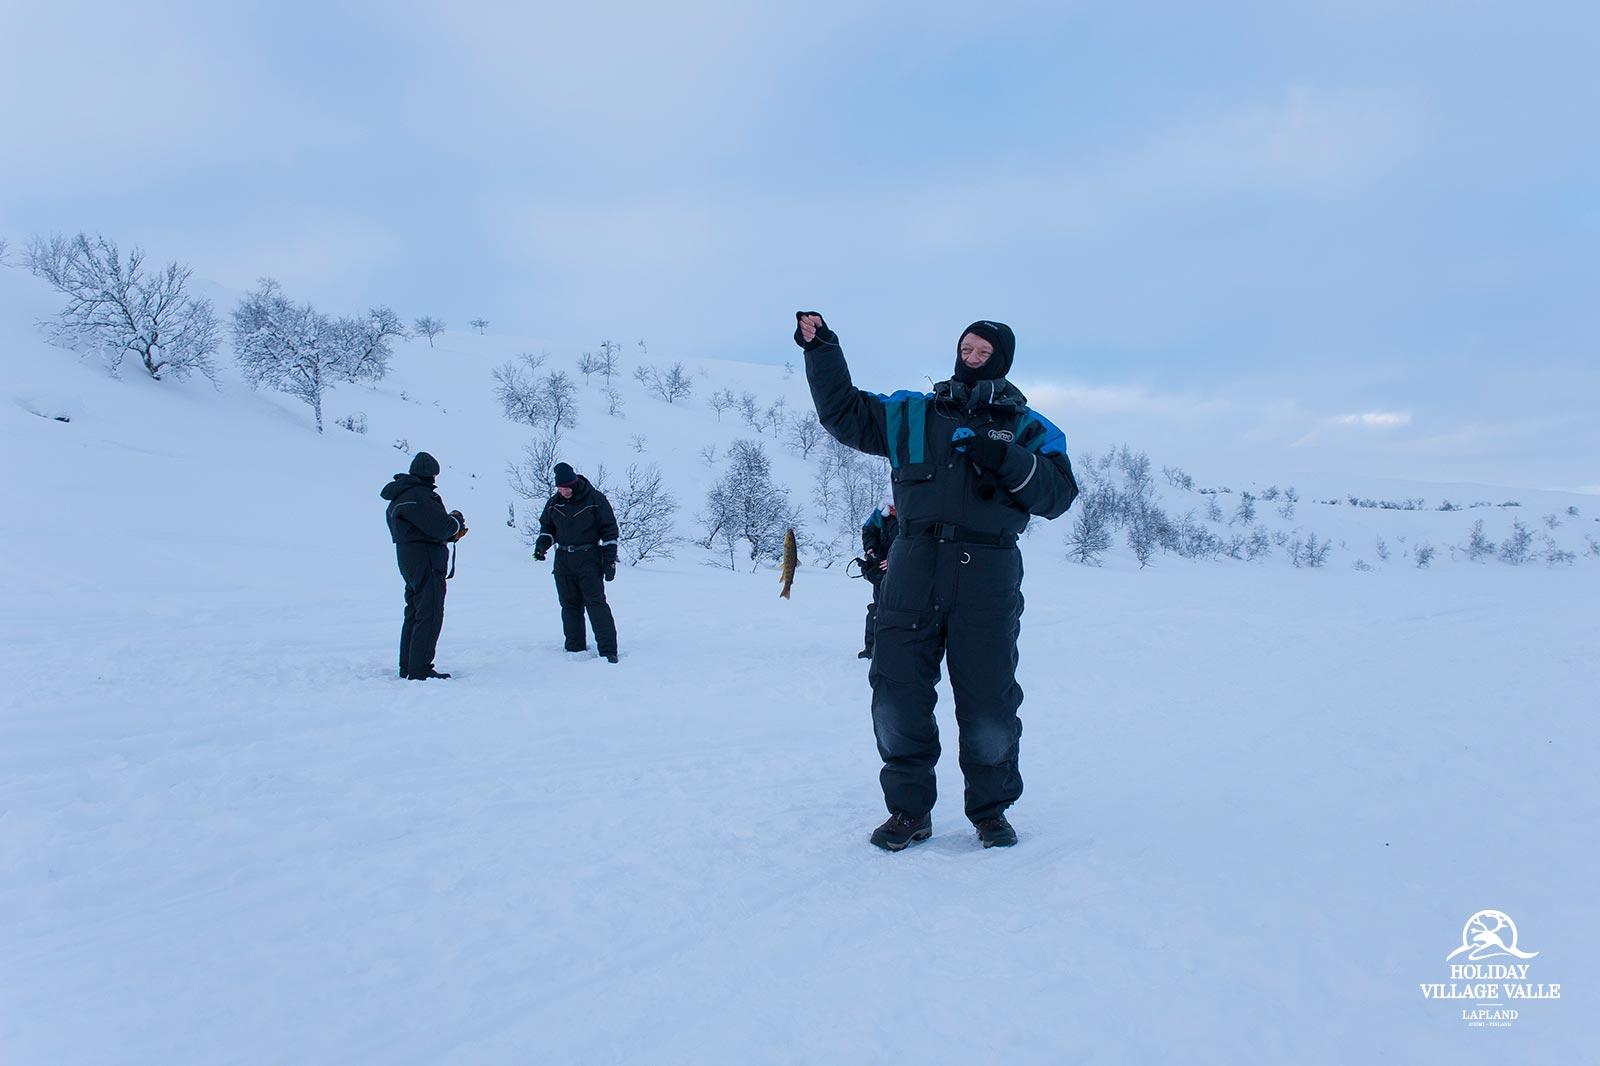 gallery-winter-adventure-holiday-village-valle-lapland-011